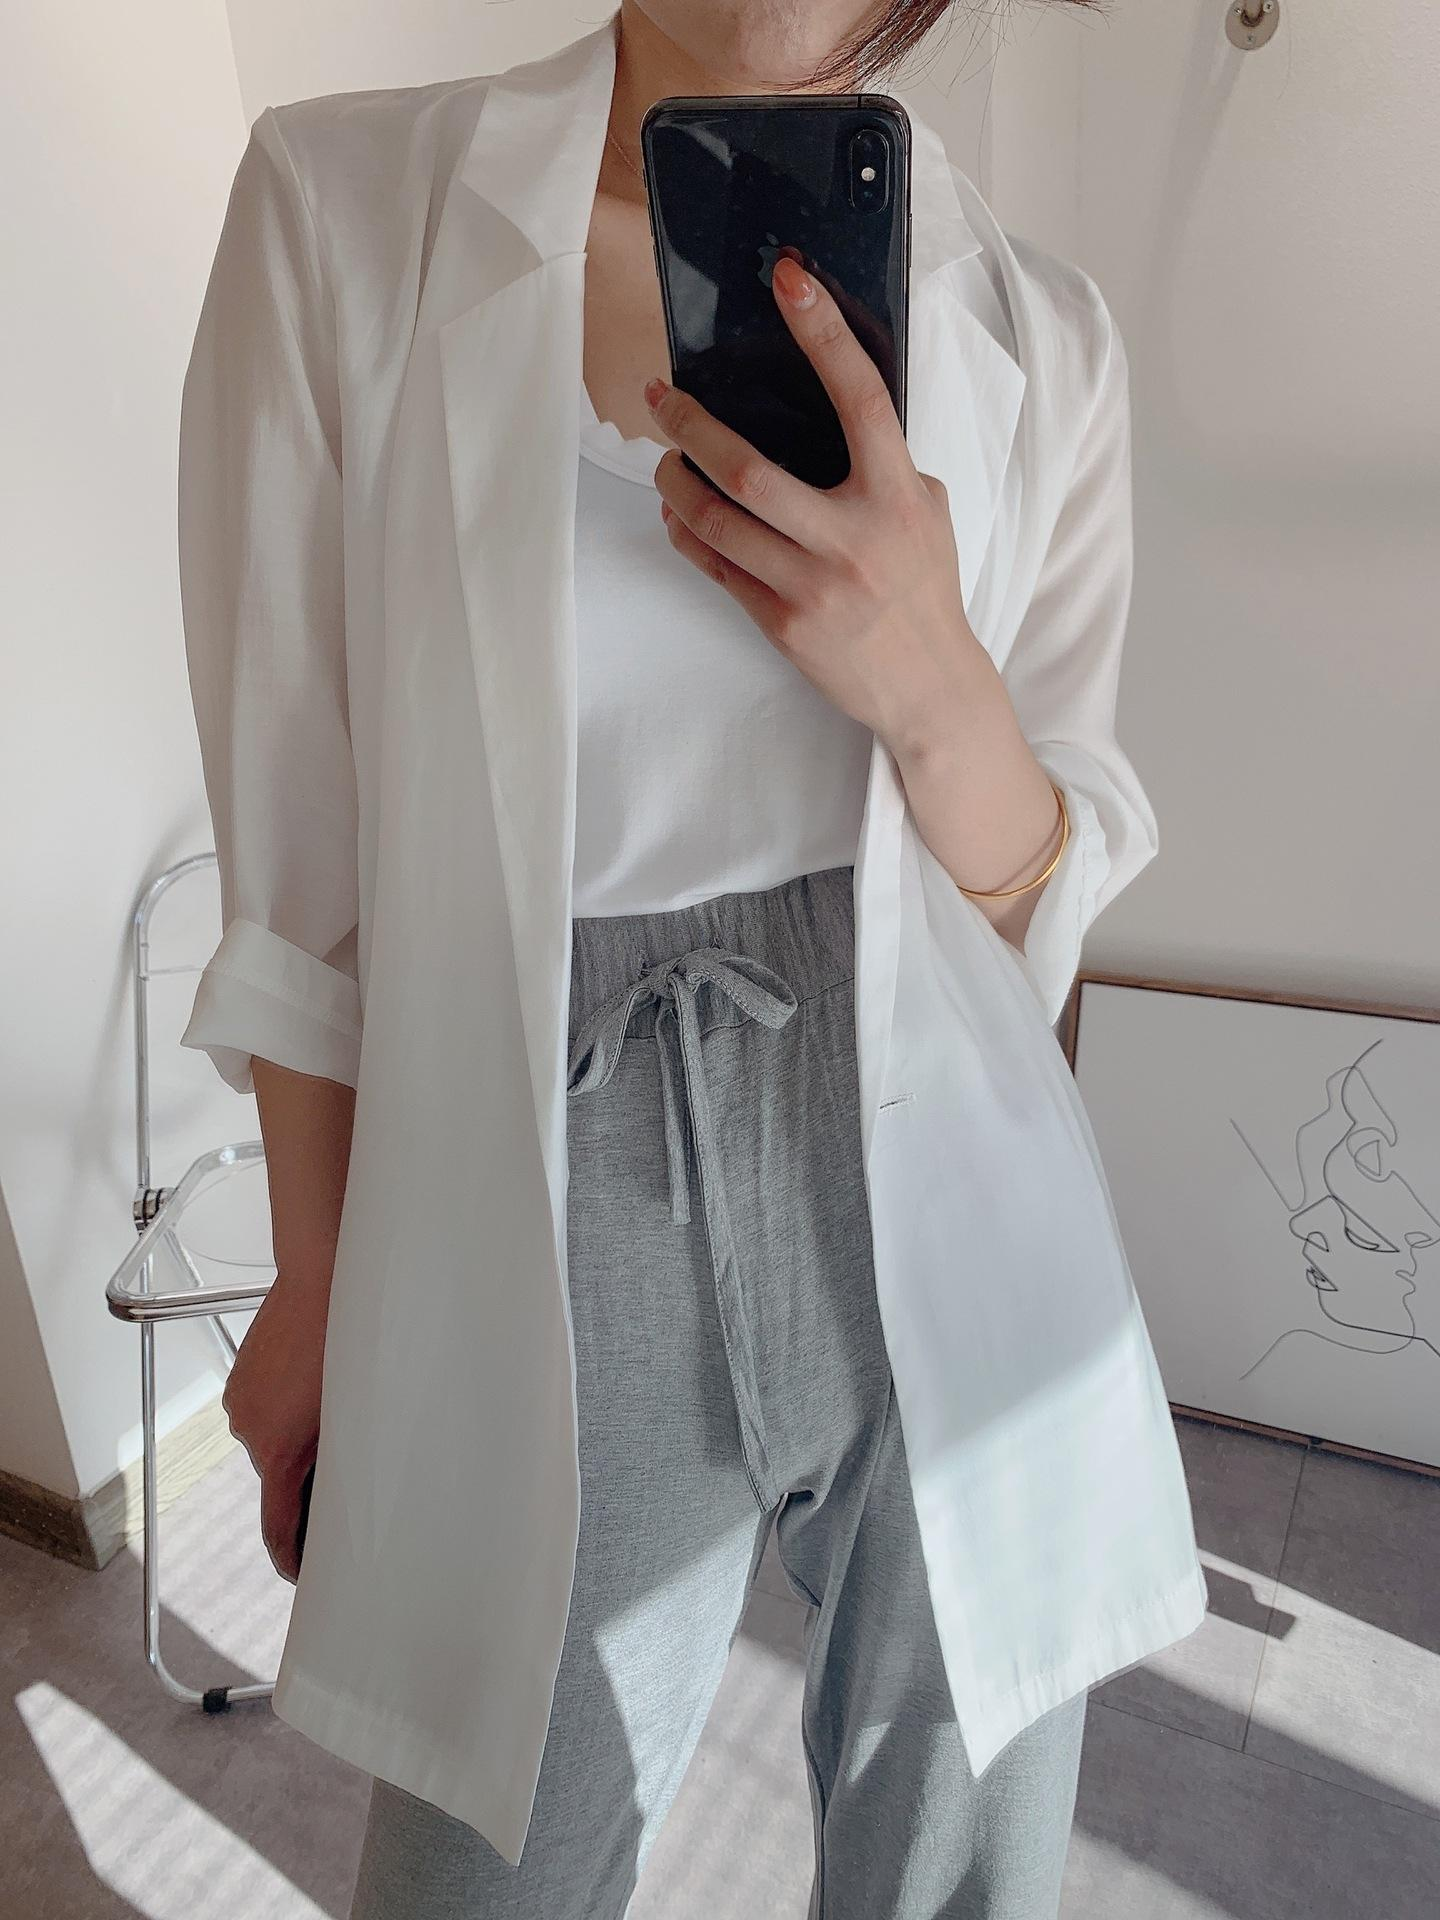 Ningdexia B sol a prueba de micro-transparente superior no entrar en serie pesar camisa superior Tencel sueltos mujer traje de camisa de manga de ocho puntos